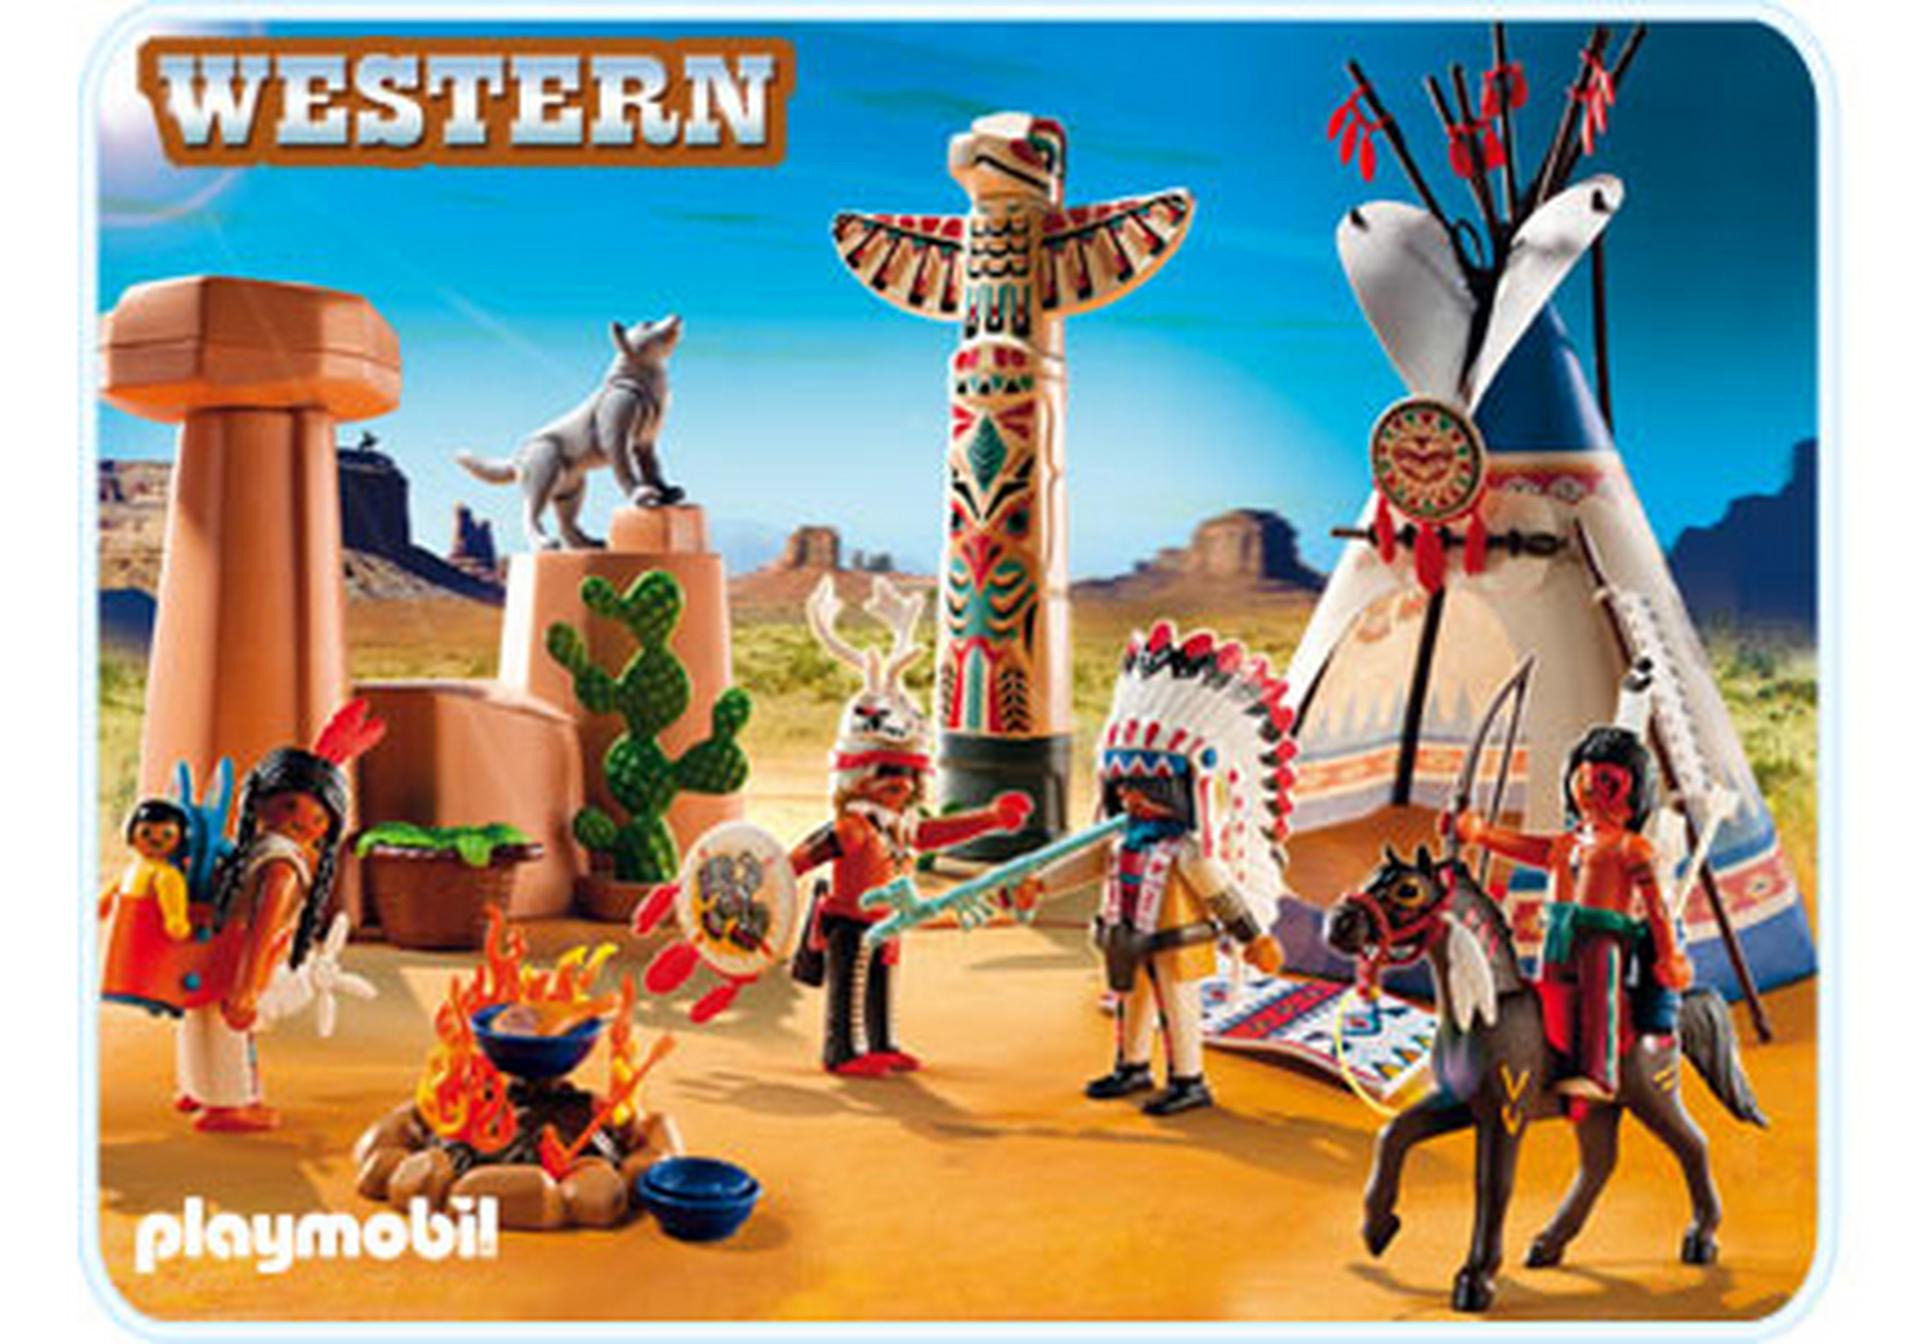 indianercamp mit totempfahl 5247 a playmobil deutschland. Black Bedroom Furniture Sets. Home Design Ideas